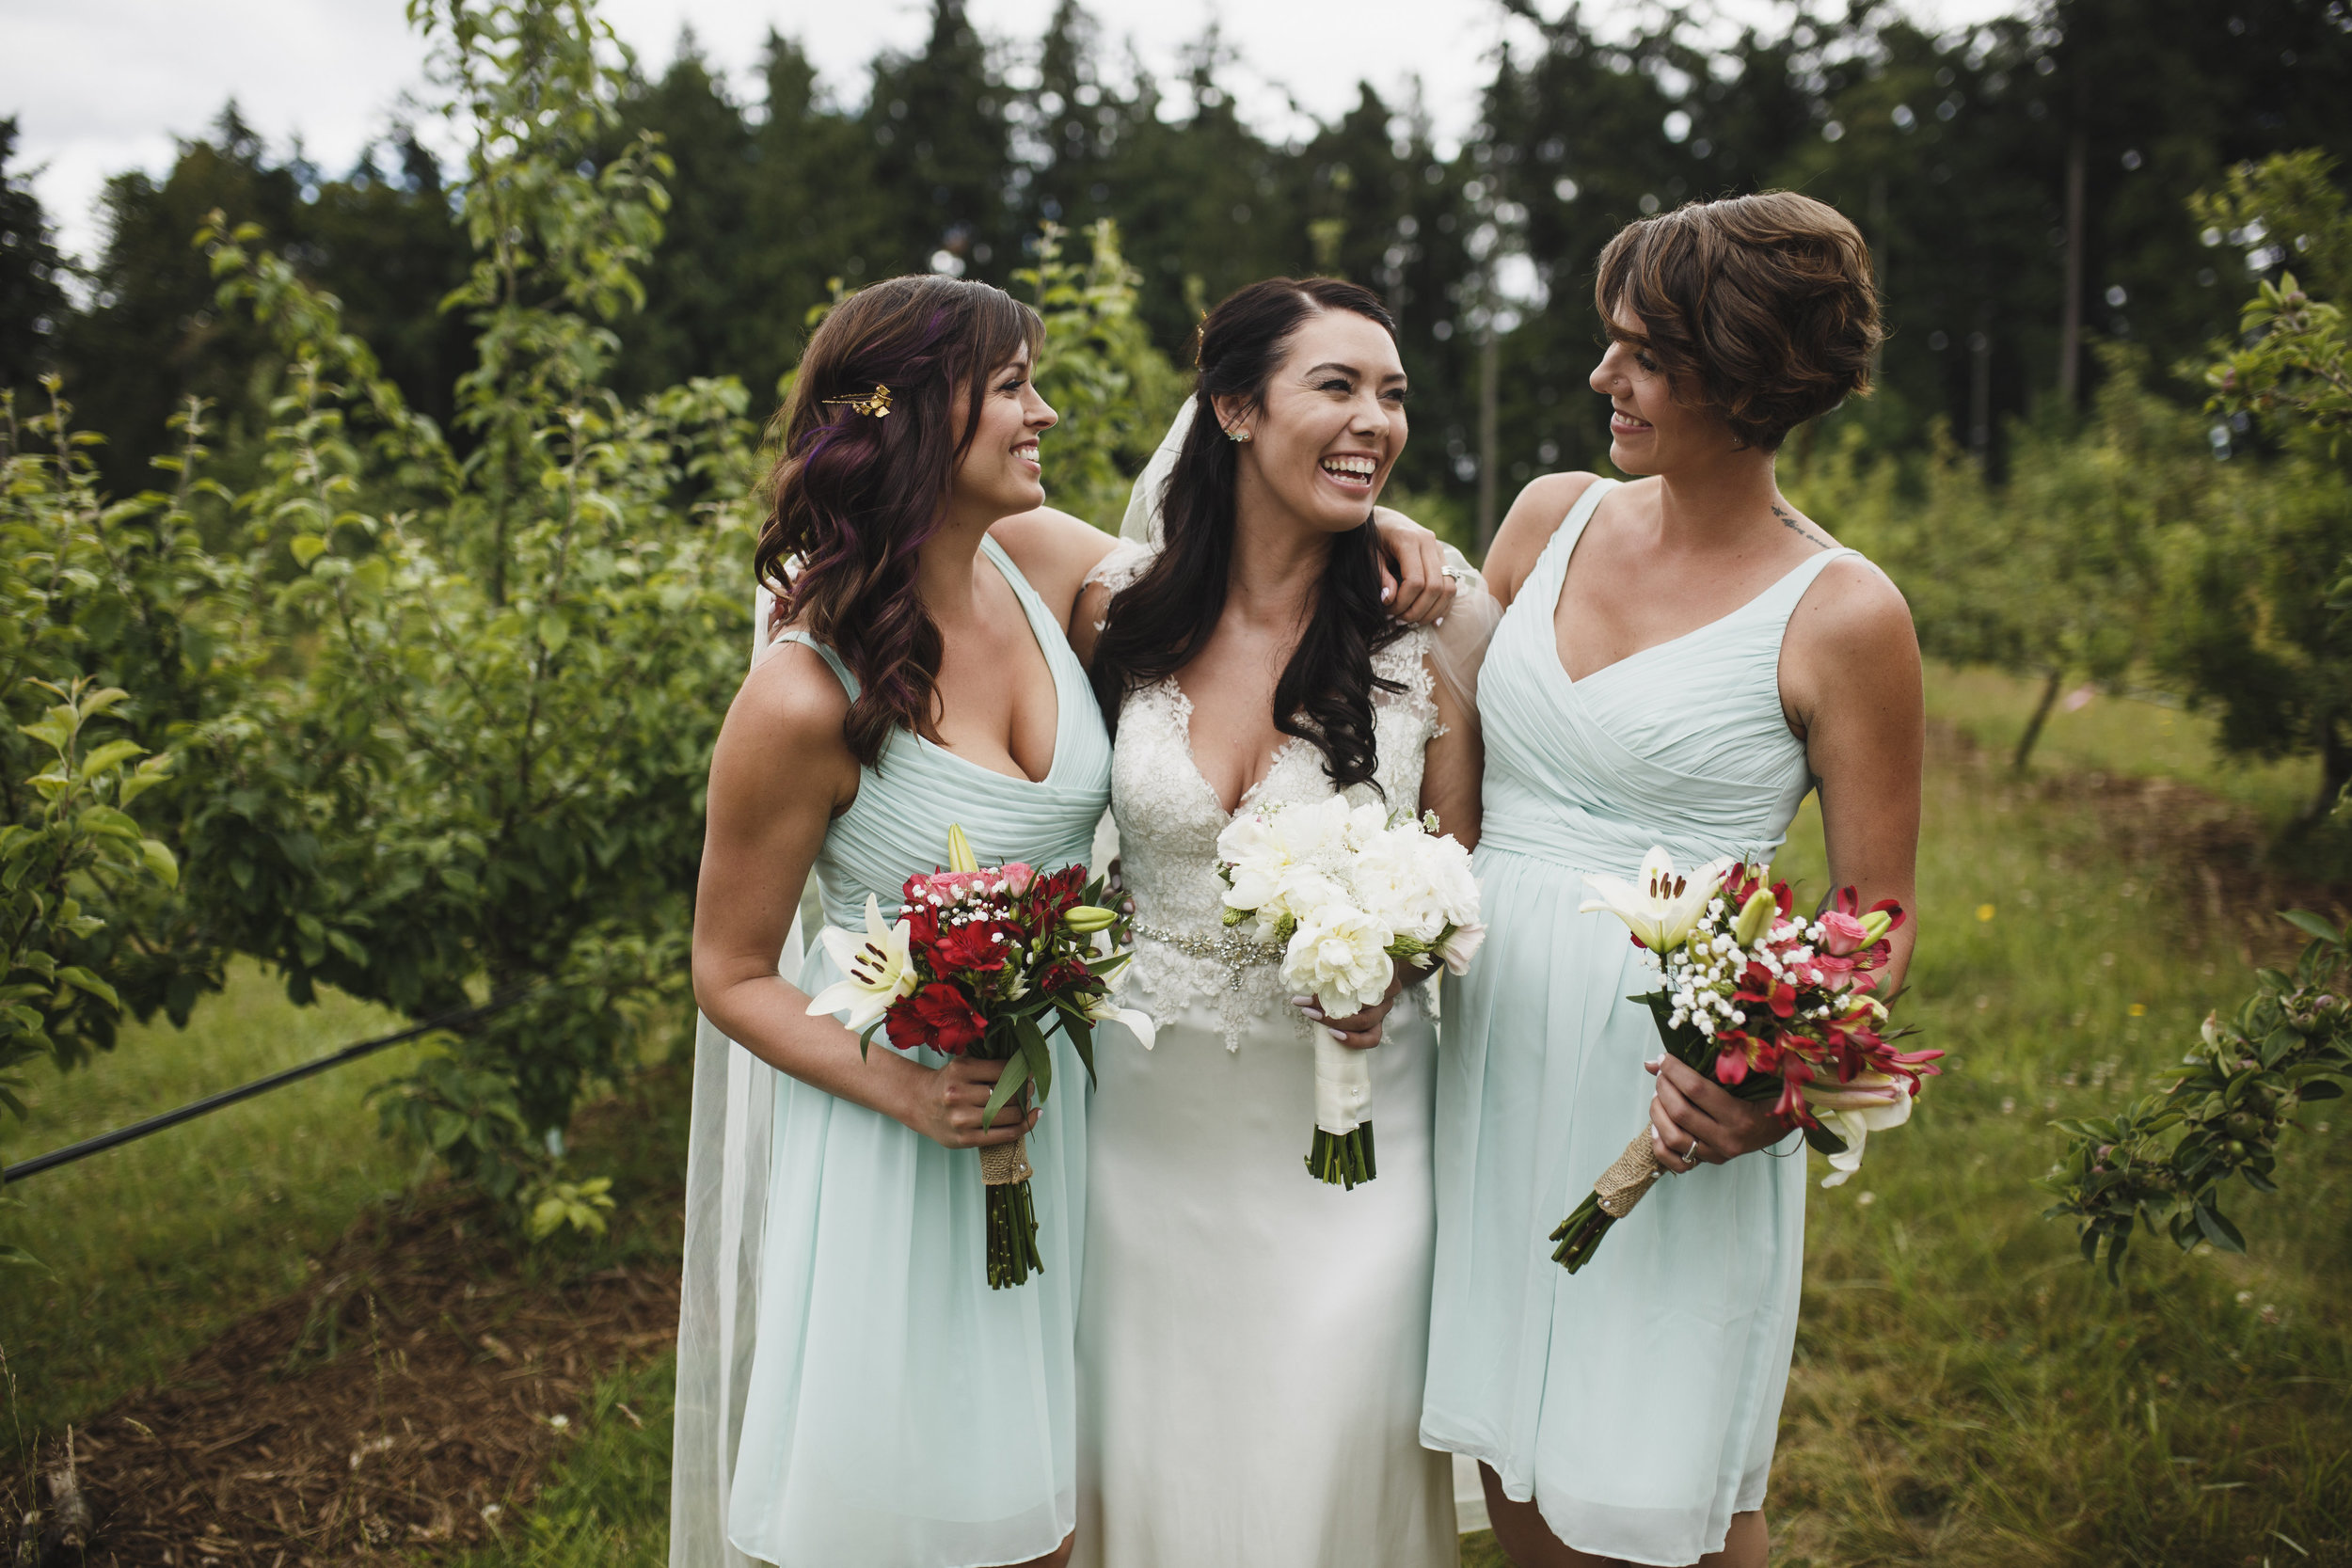 Bride with her bridesmaid Forest wedding Tofino Sea Cider Vancouver Island